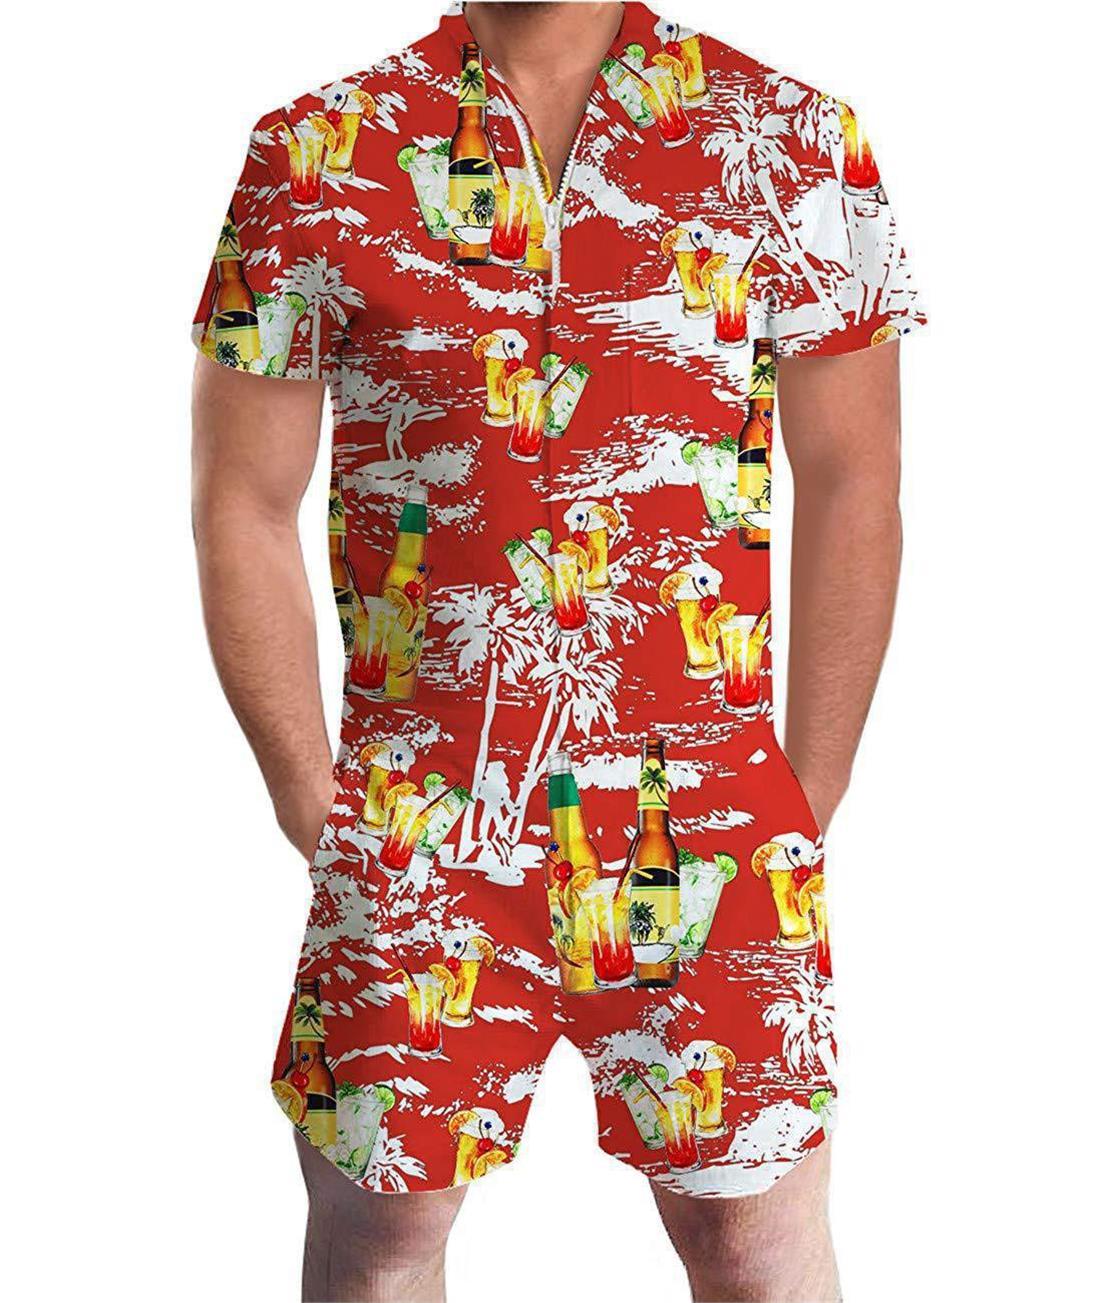 OLOEY Rompers Floral 3D Print Men Funny Jumpsuit Playsuit Male Harem Cargo Overalls Summer One Piece Beach Slim Fit Men's Sets